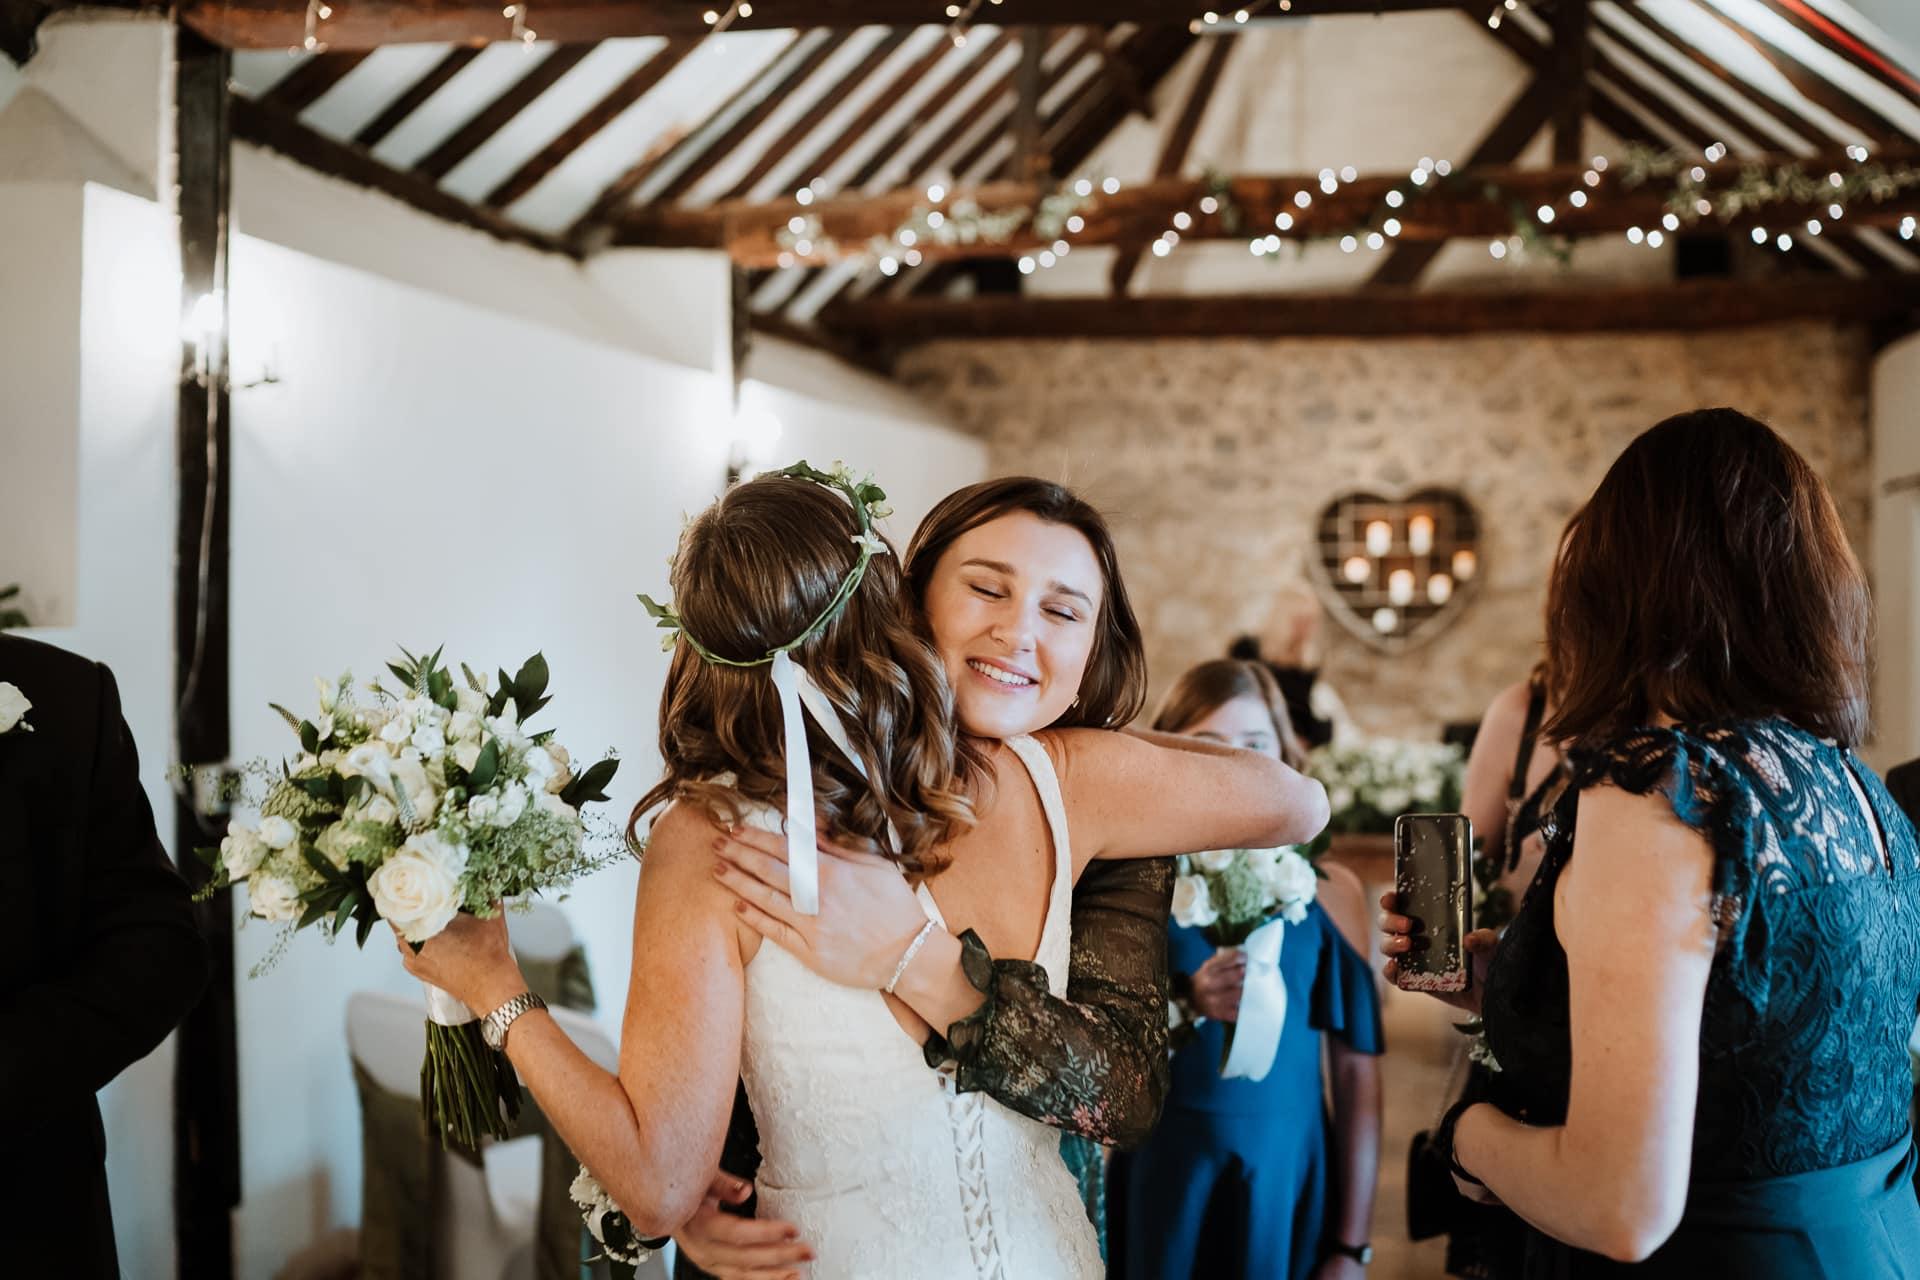 Bride hugging a relative after her ceremony